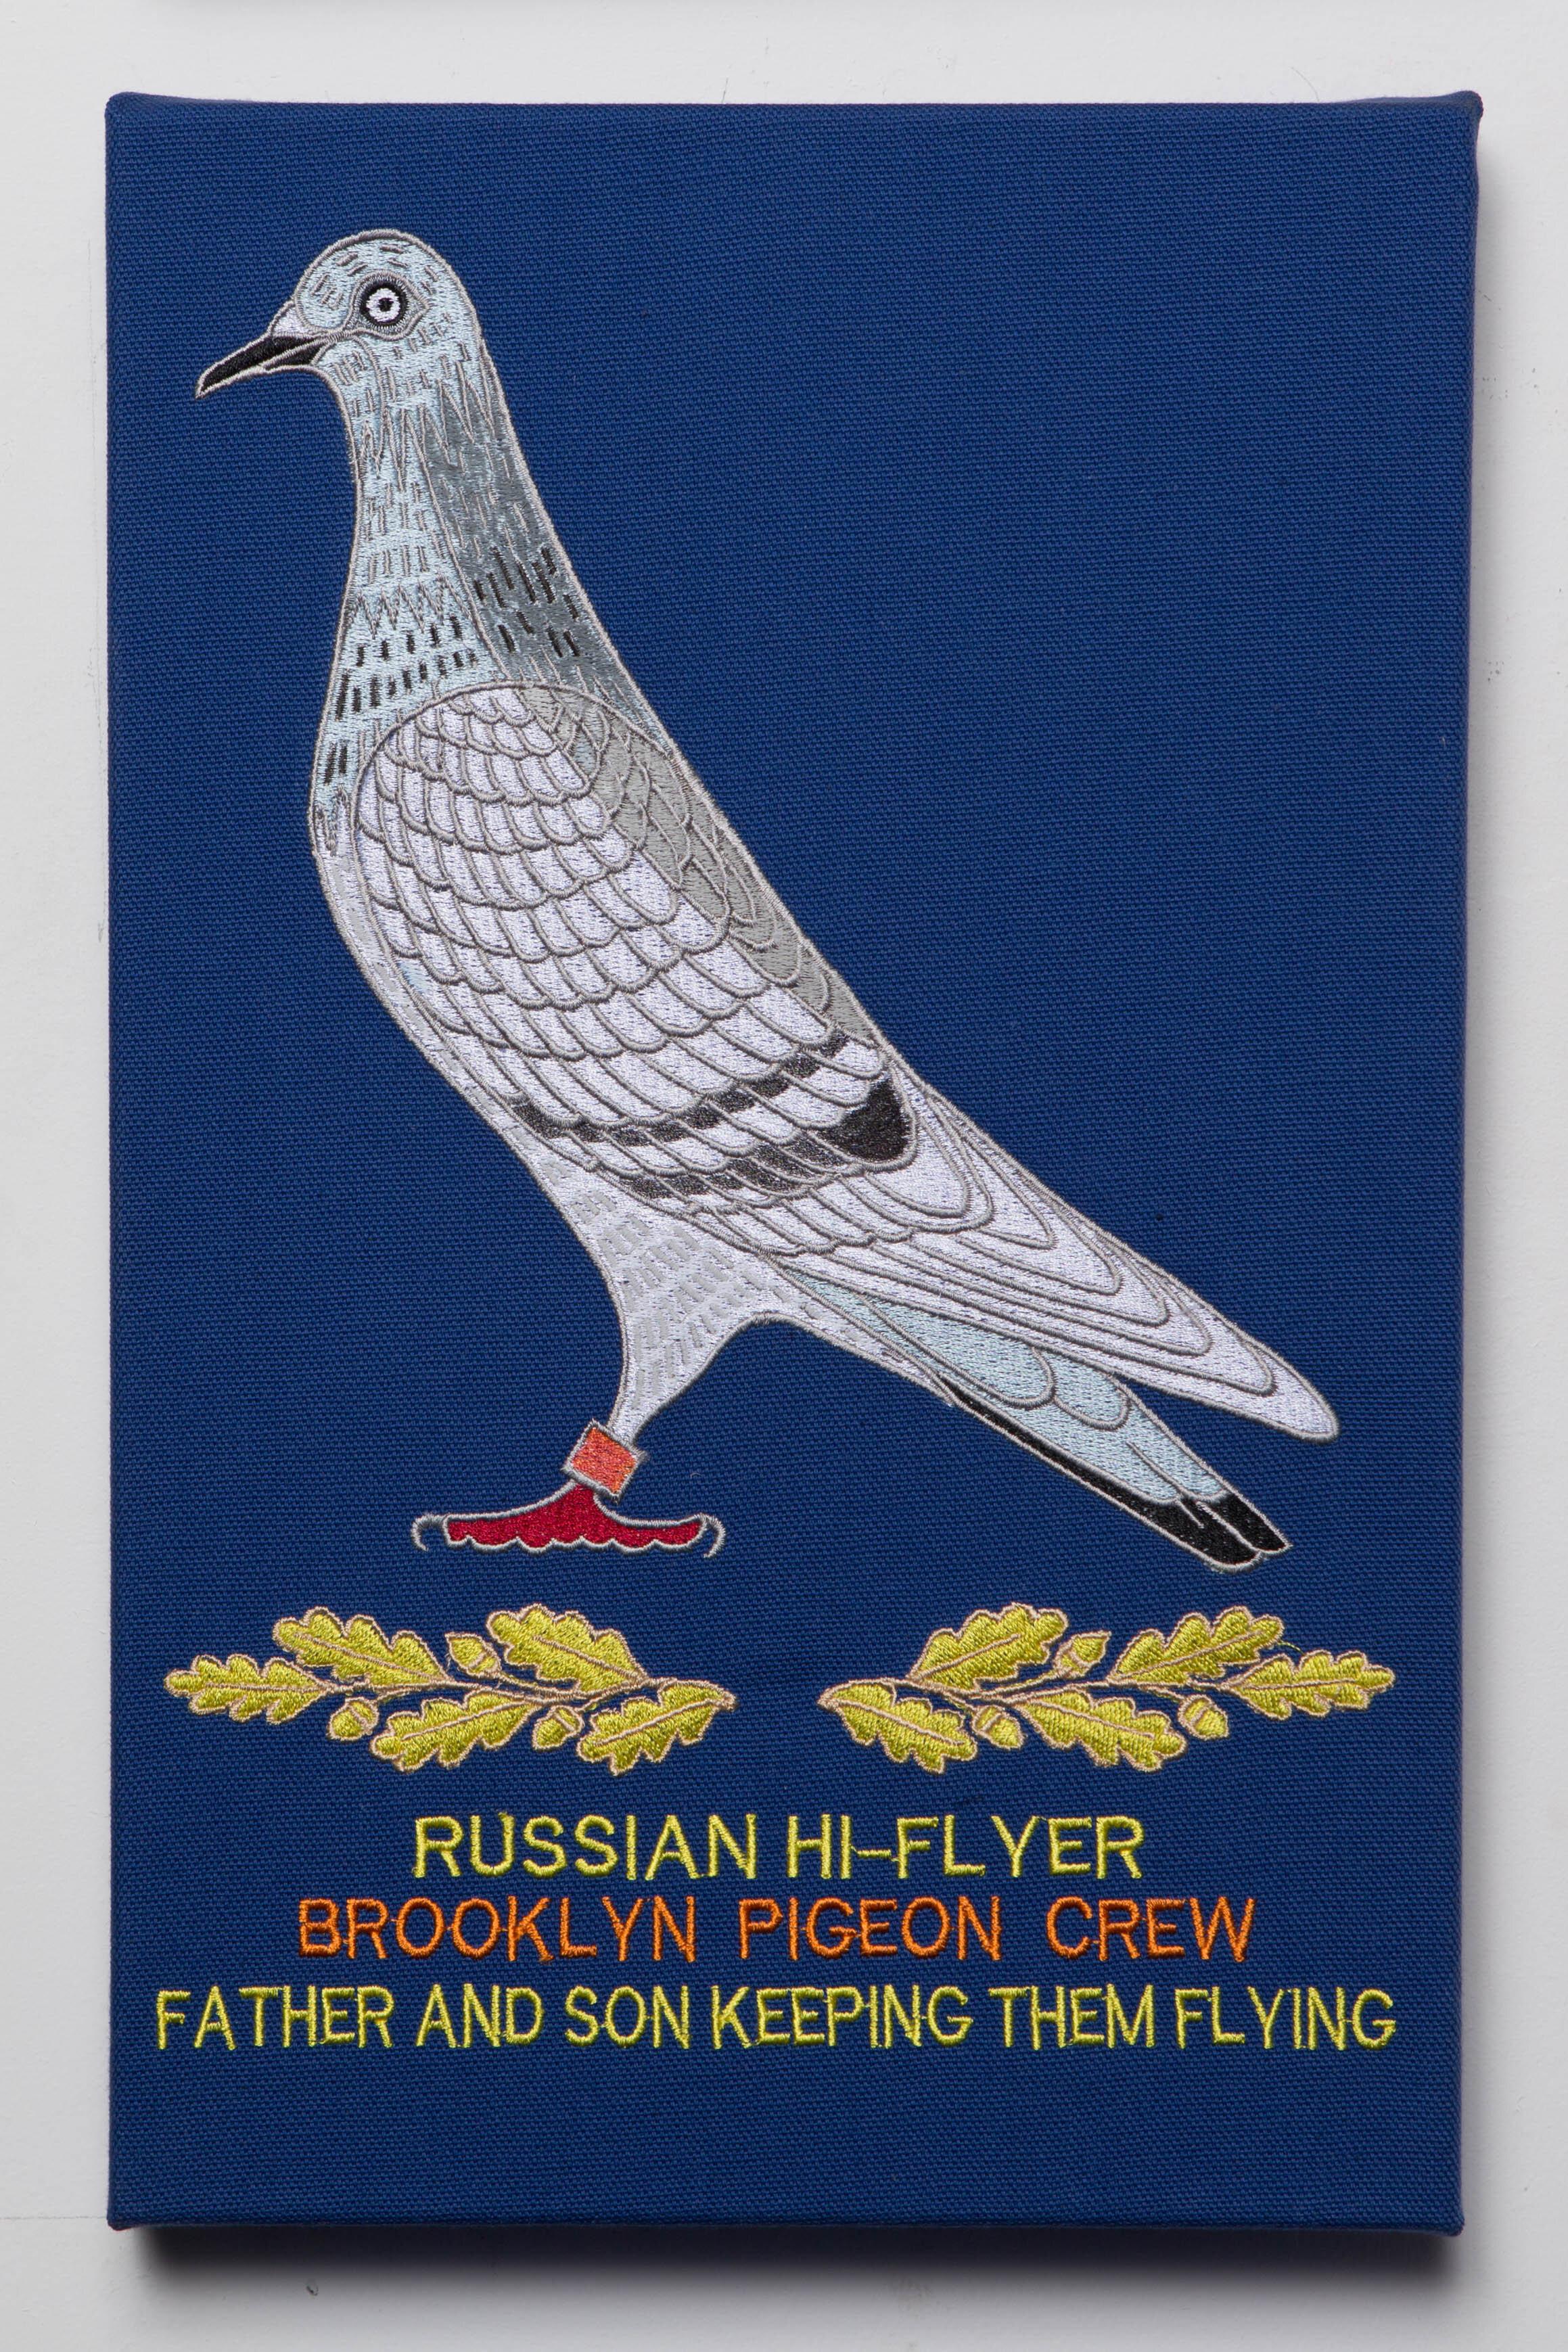 RUSSIAN_HI_FLYER_BROOKLYN_PIGEON_CREW.jpg